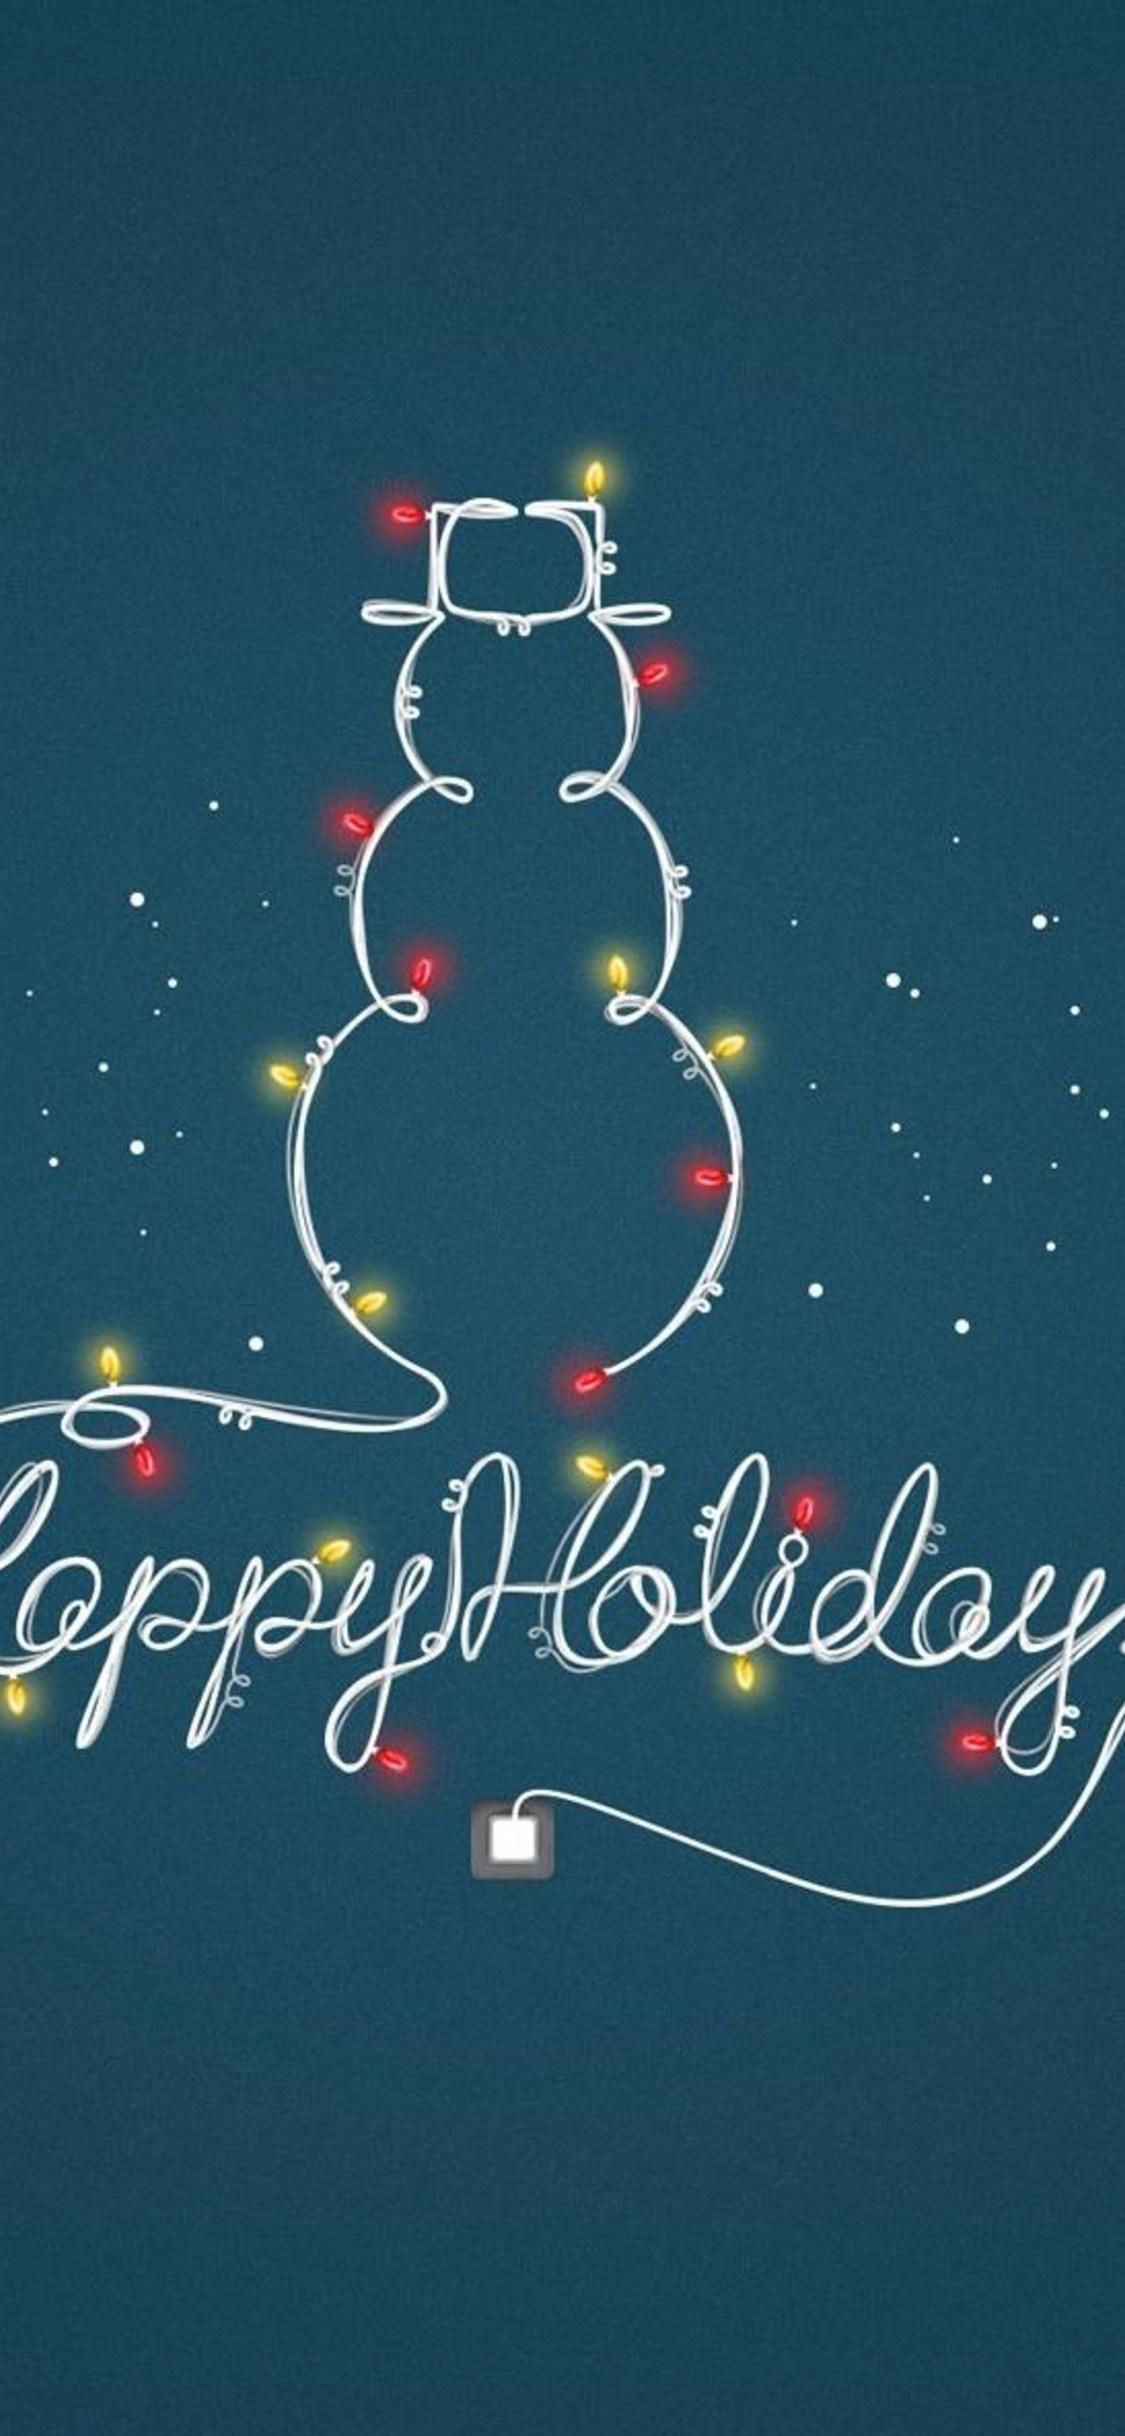 Wallpaper Happy Holidays 1125x2436. Download